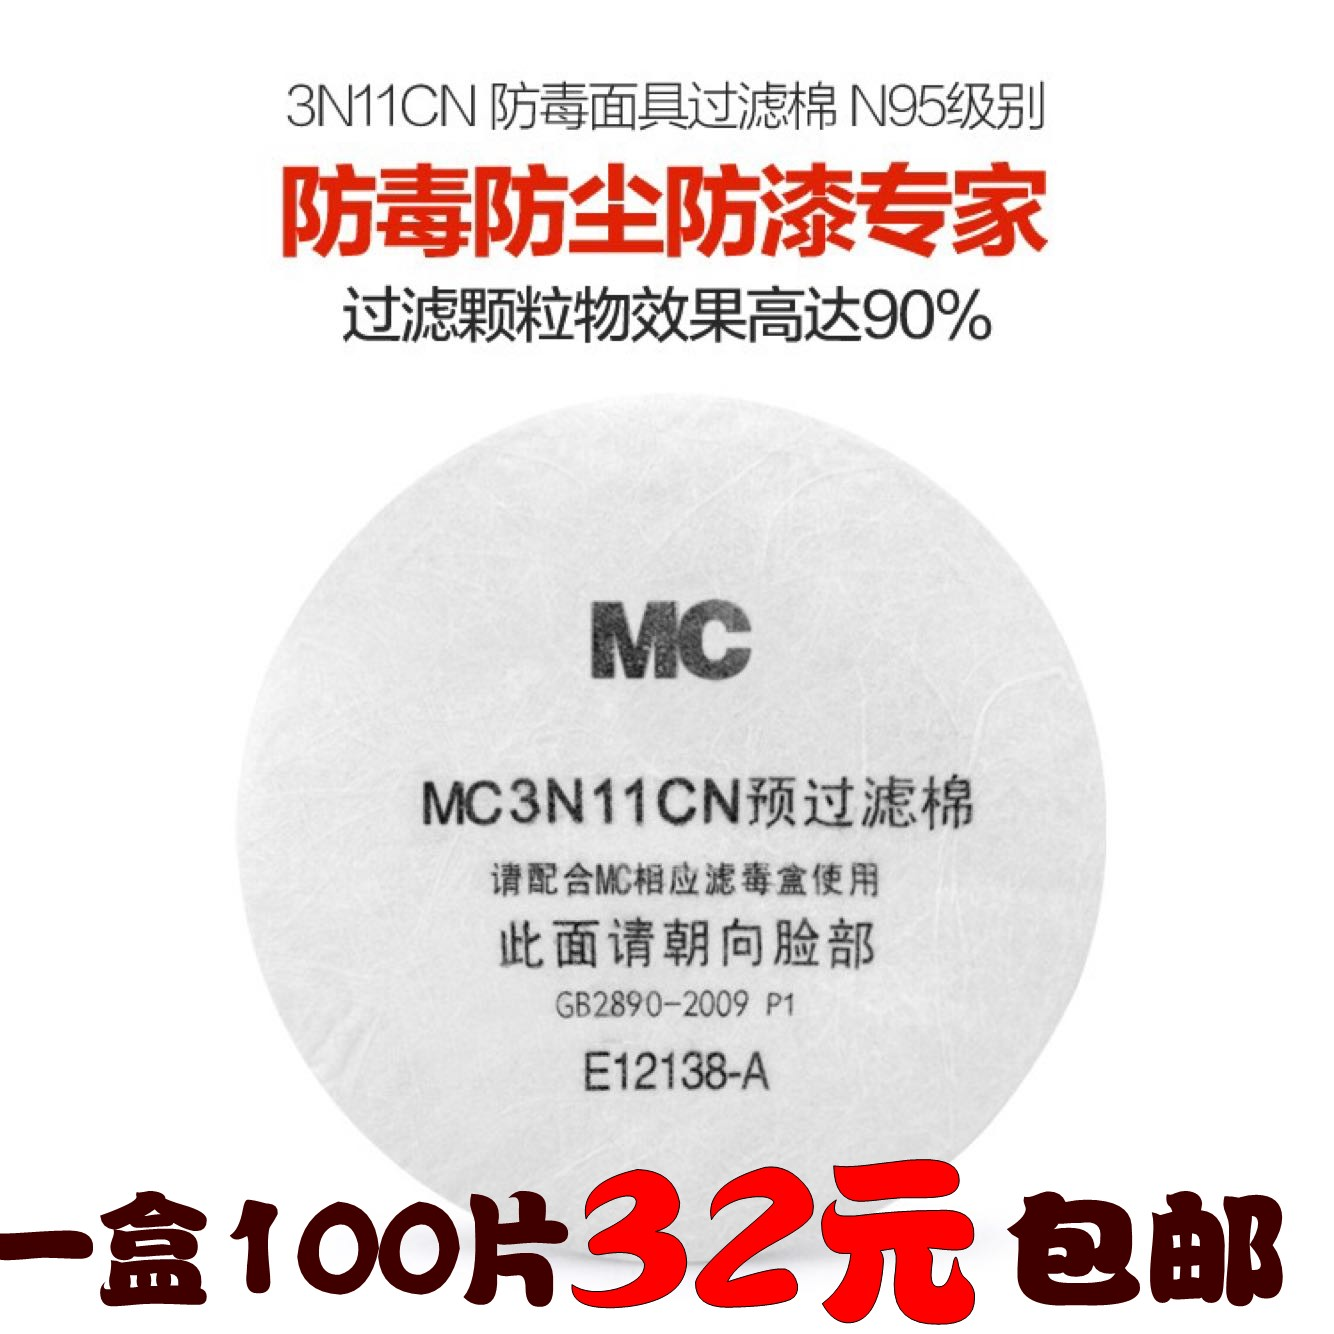 3N11CN新款预过滤棉3N11防毒3200面具配3M防尘口罩圆形颗粒